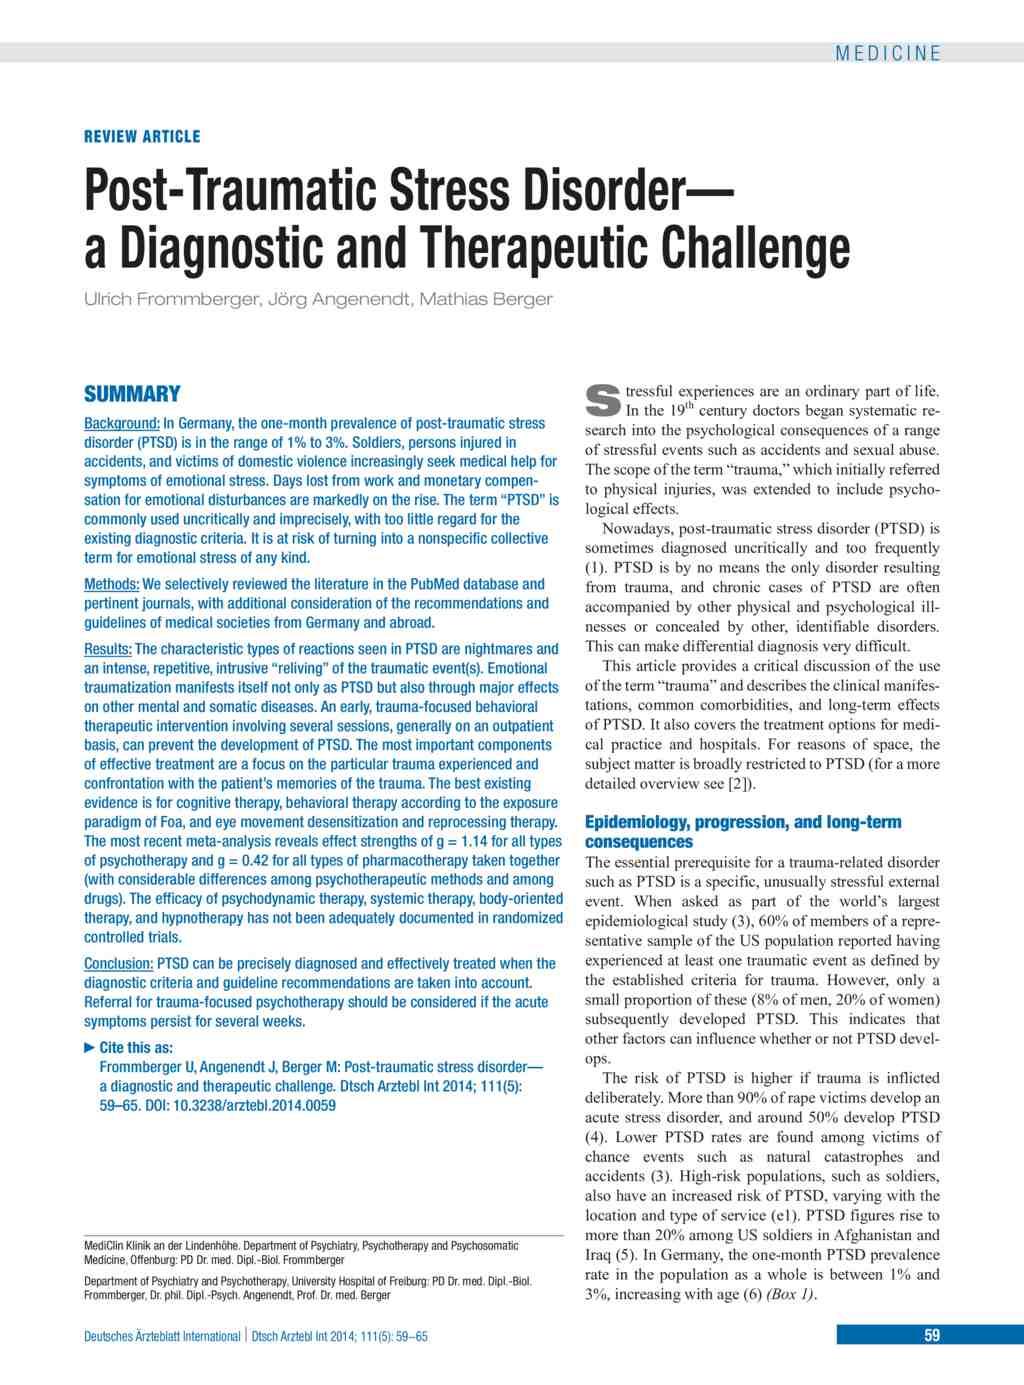 Post-Traumatic Stress Disorder (31 01 2014)